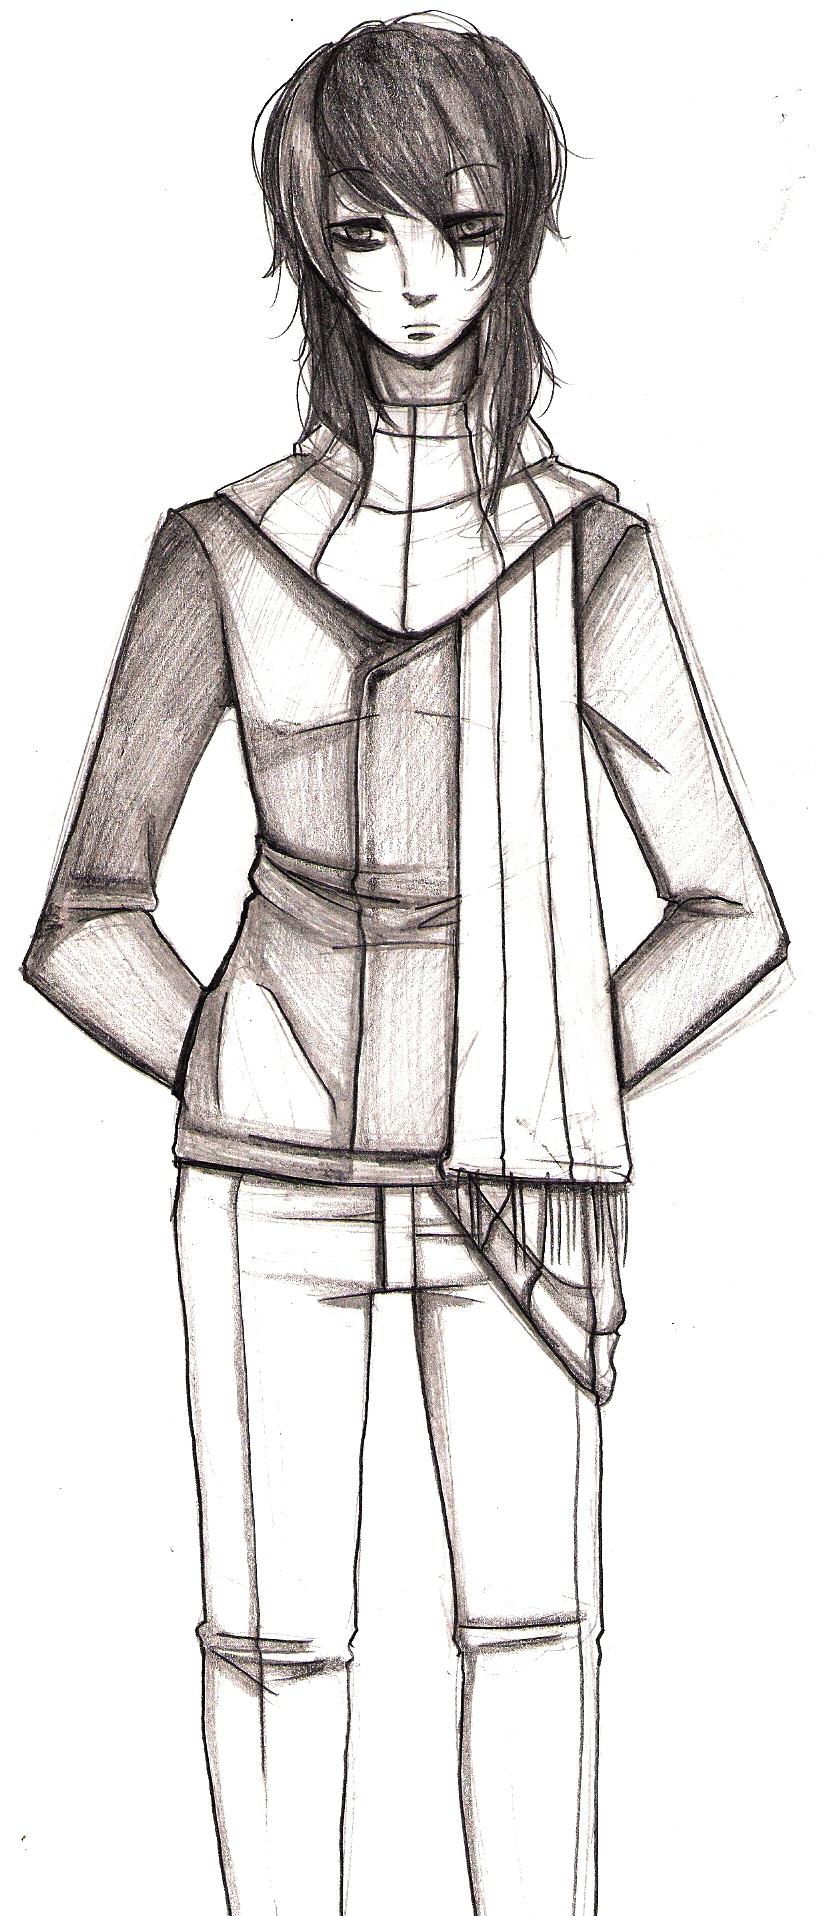 KuroSaburo's Profile Picture